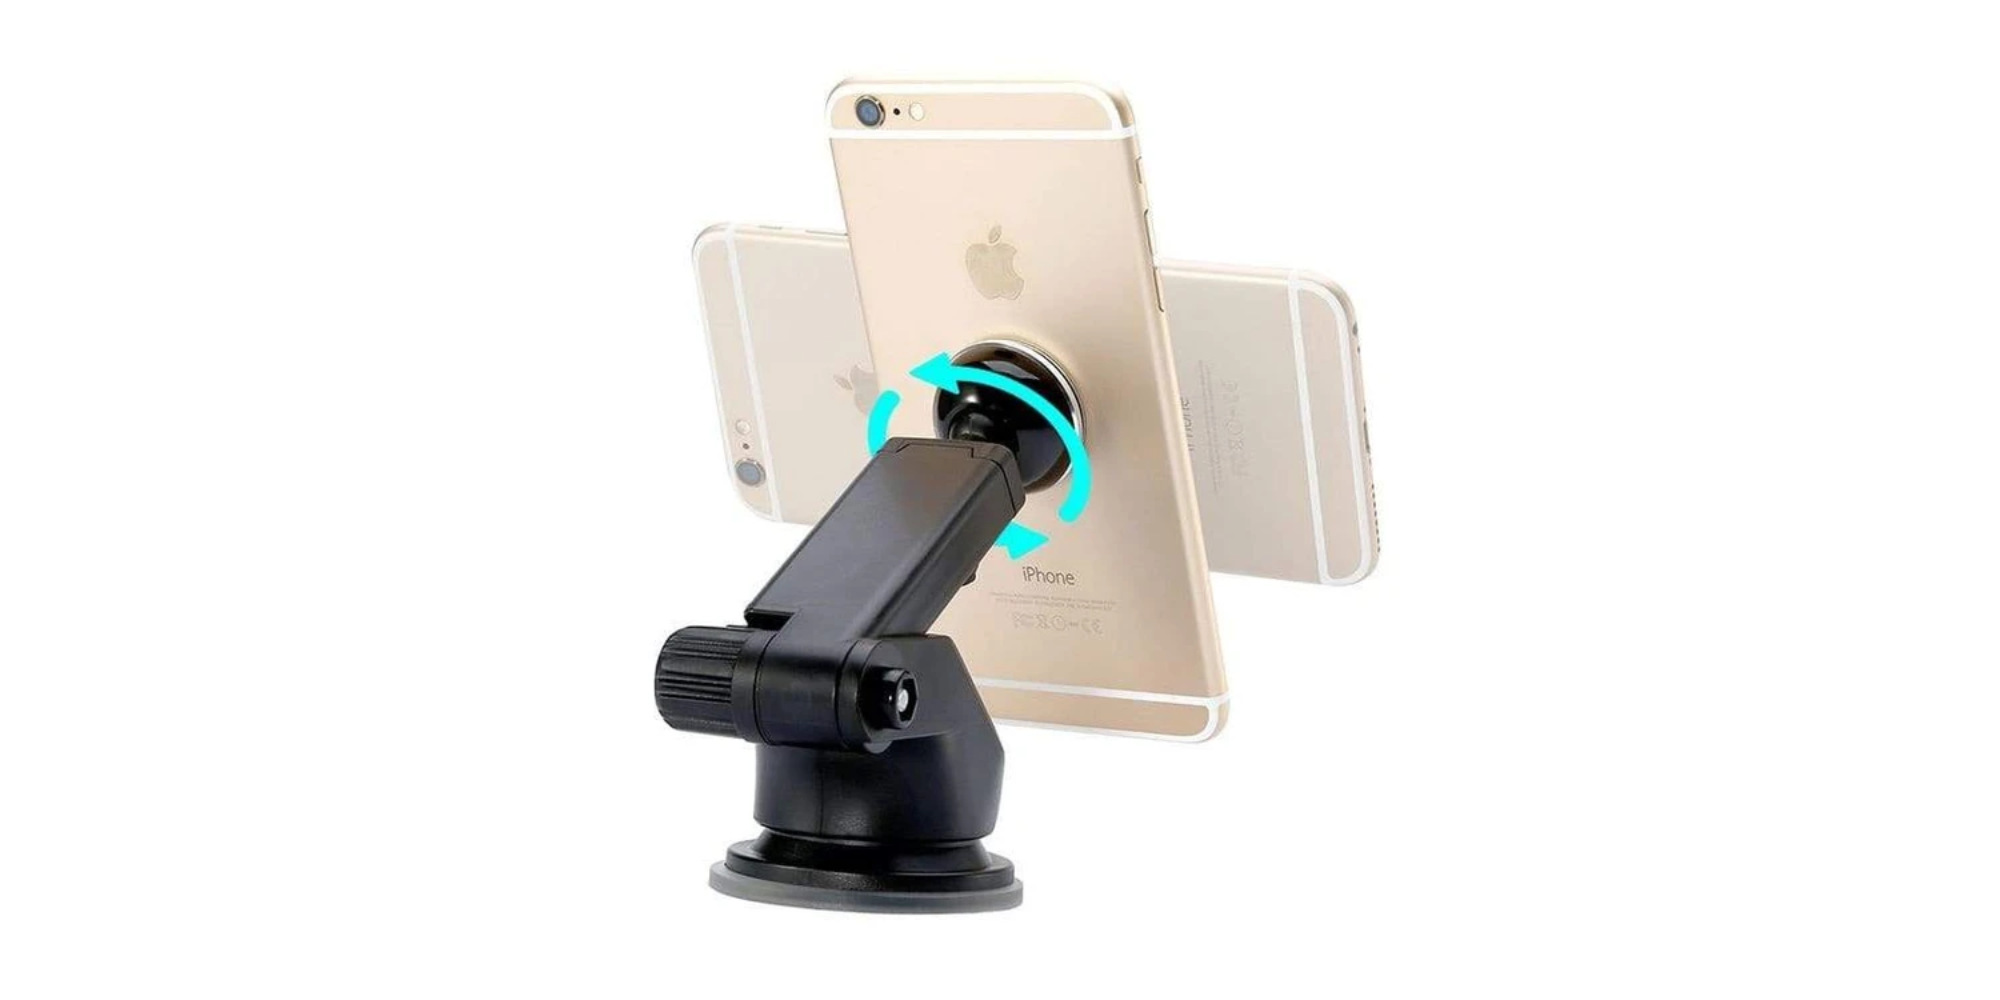 Baseus Solid Series Telescopic Magnetic Car Mount - أفضل حوامل الهاتف